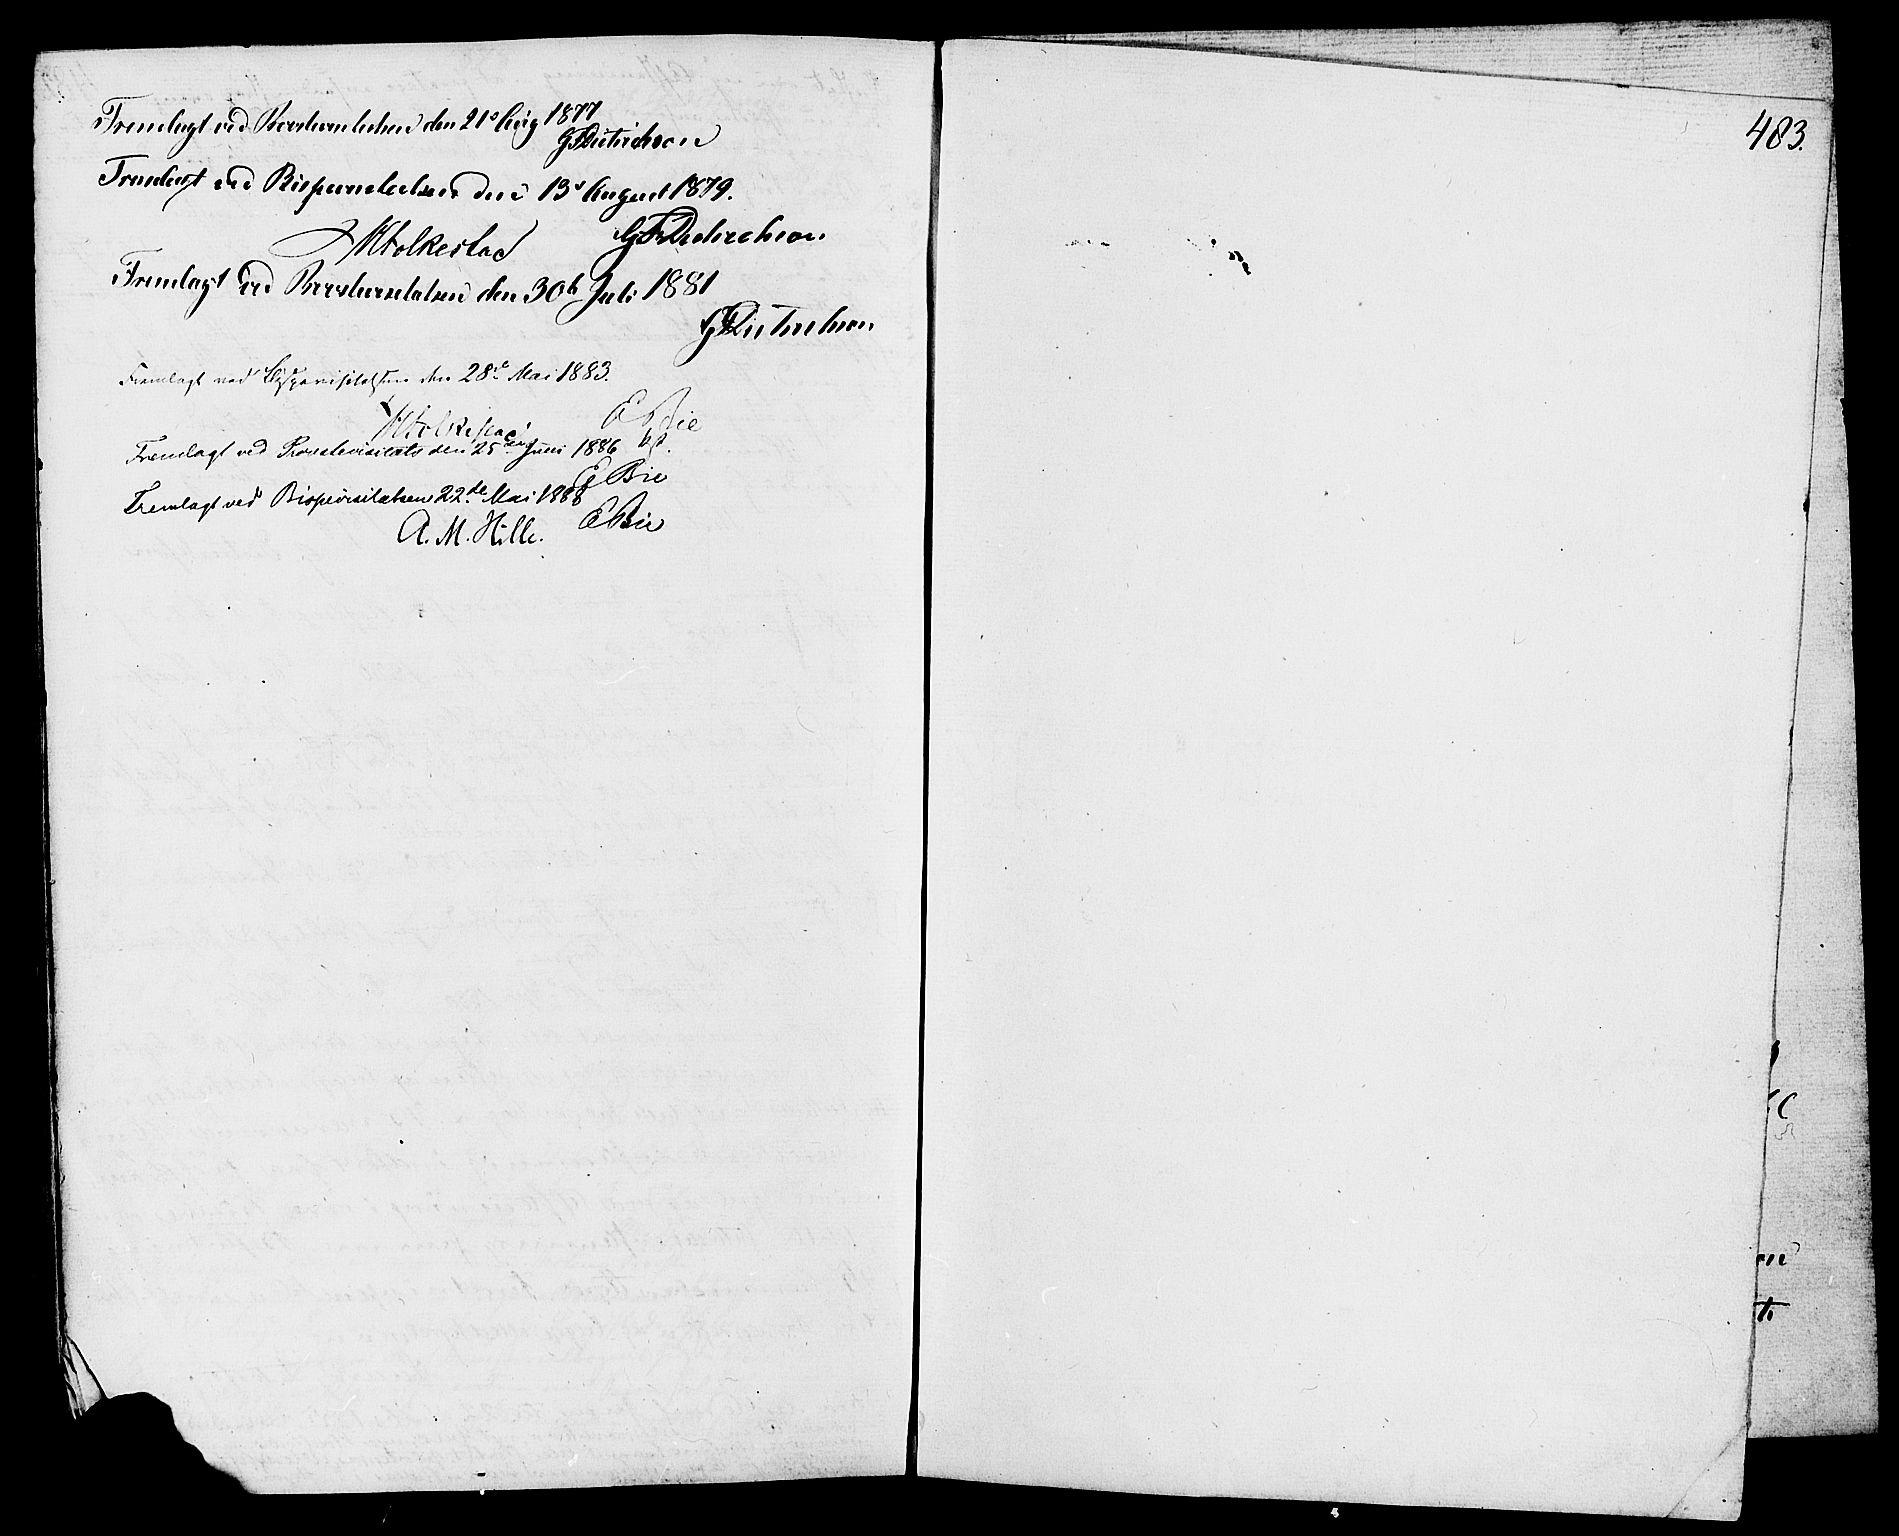 SAH, Biri prestekontor, Ministerialbok nr. 6, 1877-1886, s. 483